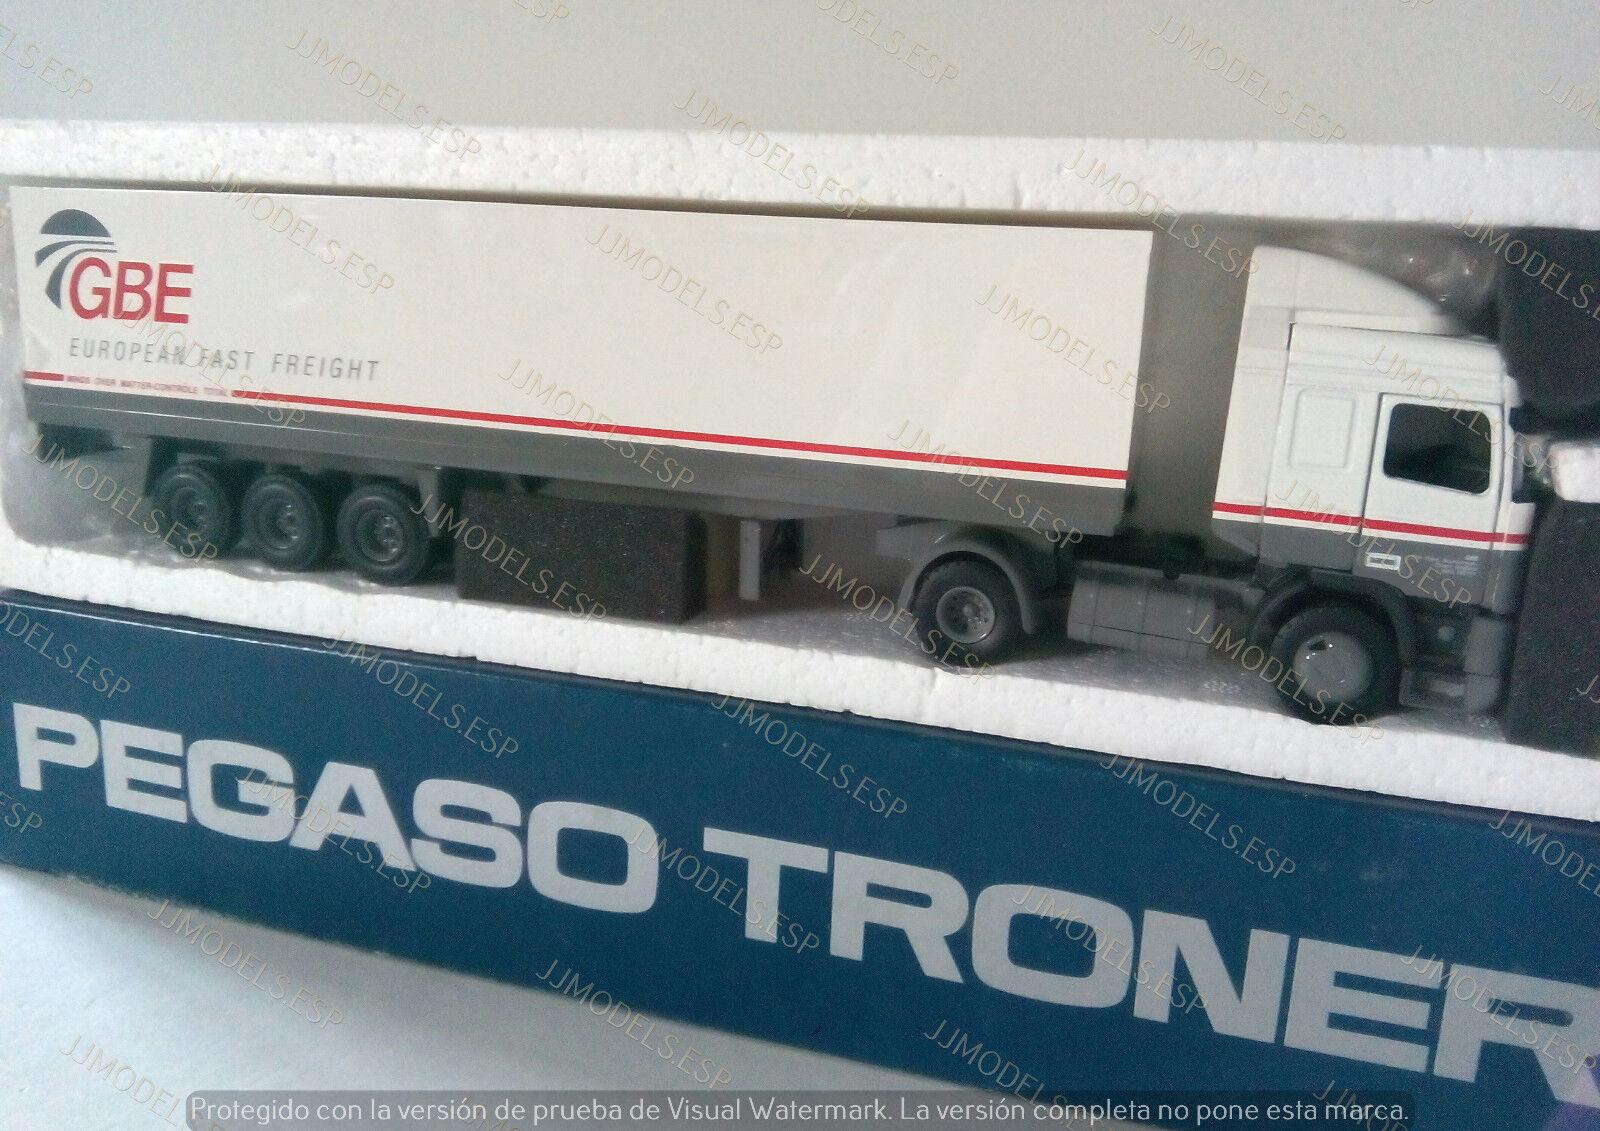 ♠TEKNO PEGASO TRONER TX360 (4X2) '92 SEMI REMOLQUE FRIGO FRIGO FRIGO